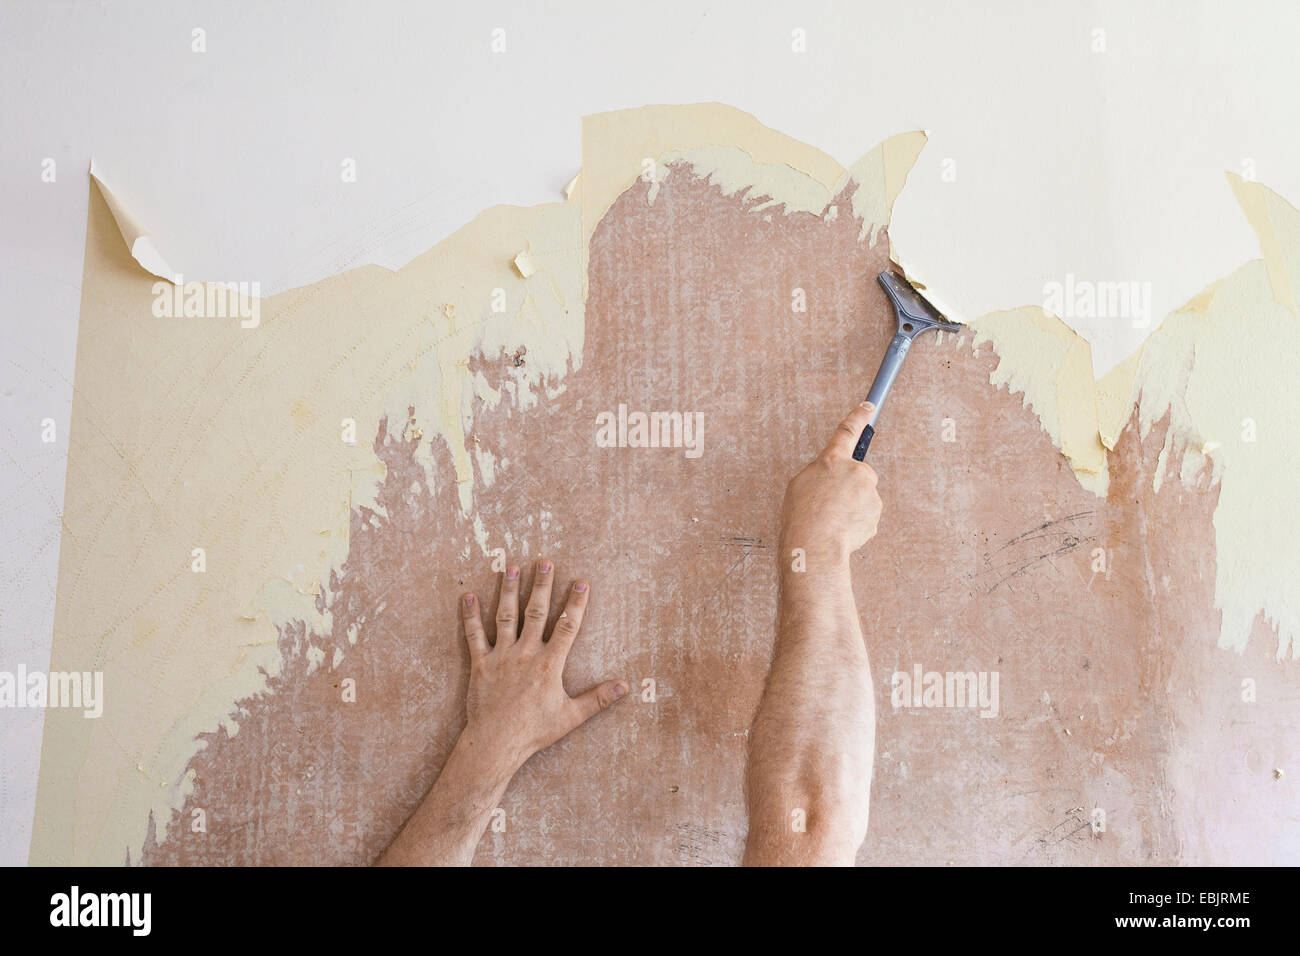 Mature man using scraper to scrape off old wallpaper - Stock Image